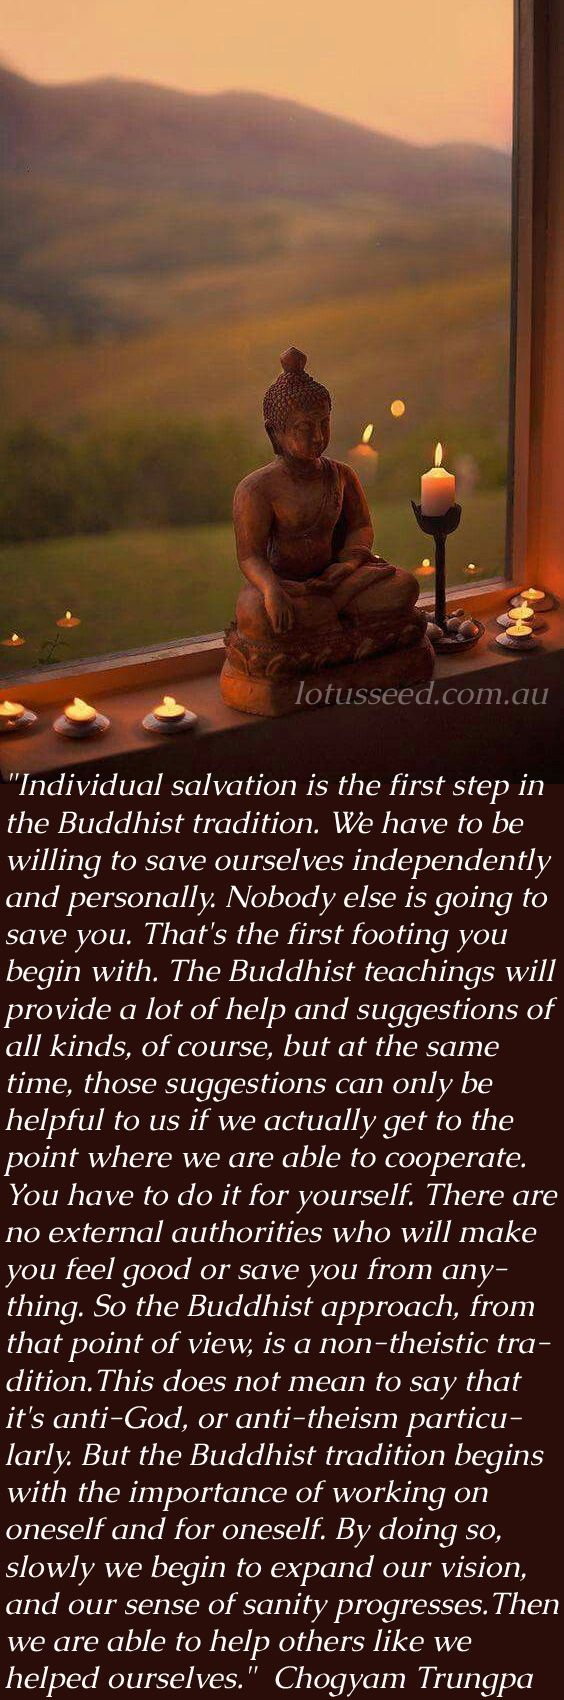 Chogyam Trungpa Buddhist Zen quotes by lotusseed.com.au